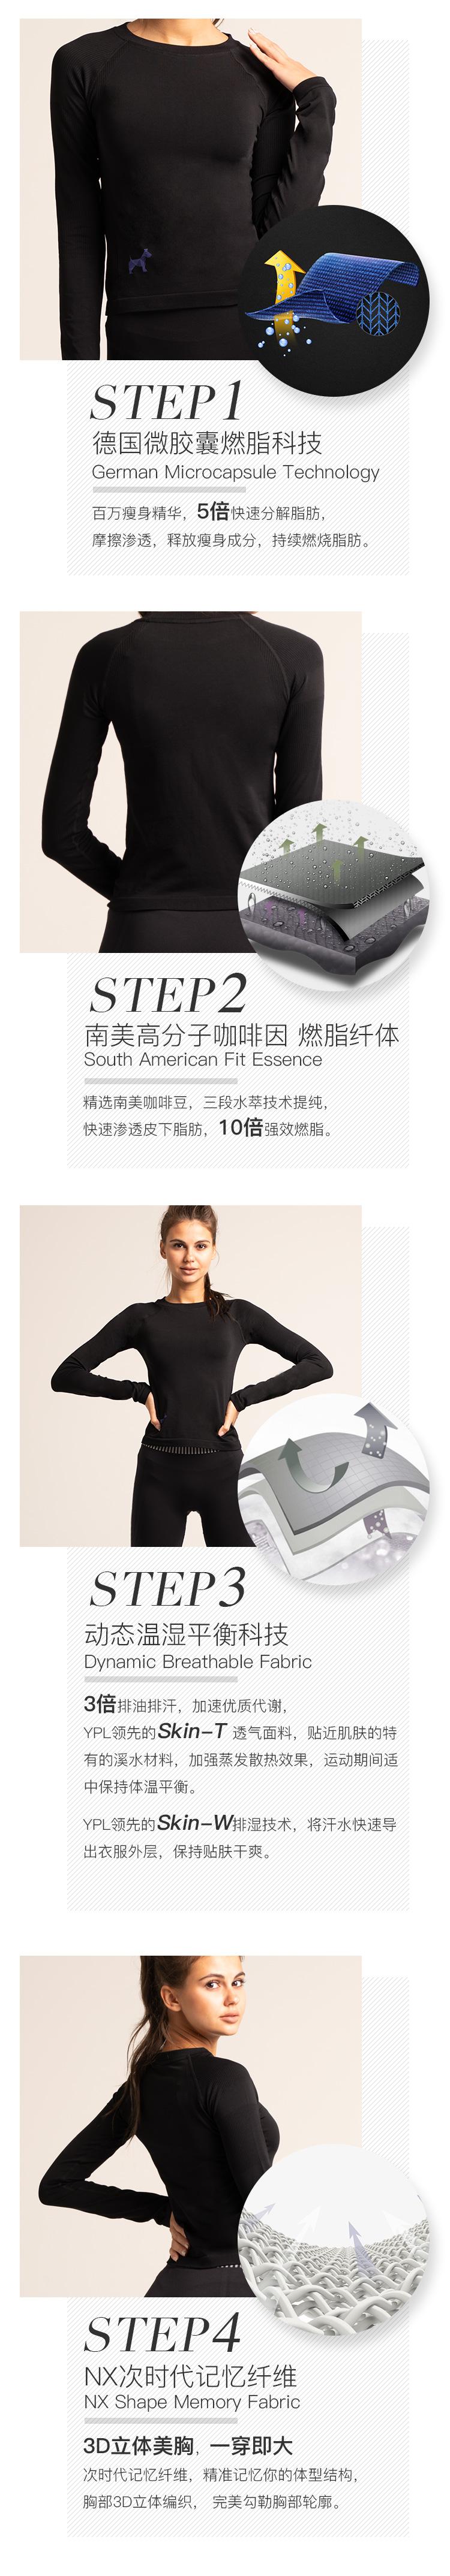 YPL 光速瘦身衣 – Shanghai Healthy 保健,美妆和个人护理商品